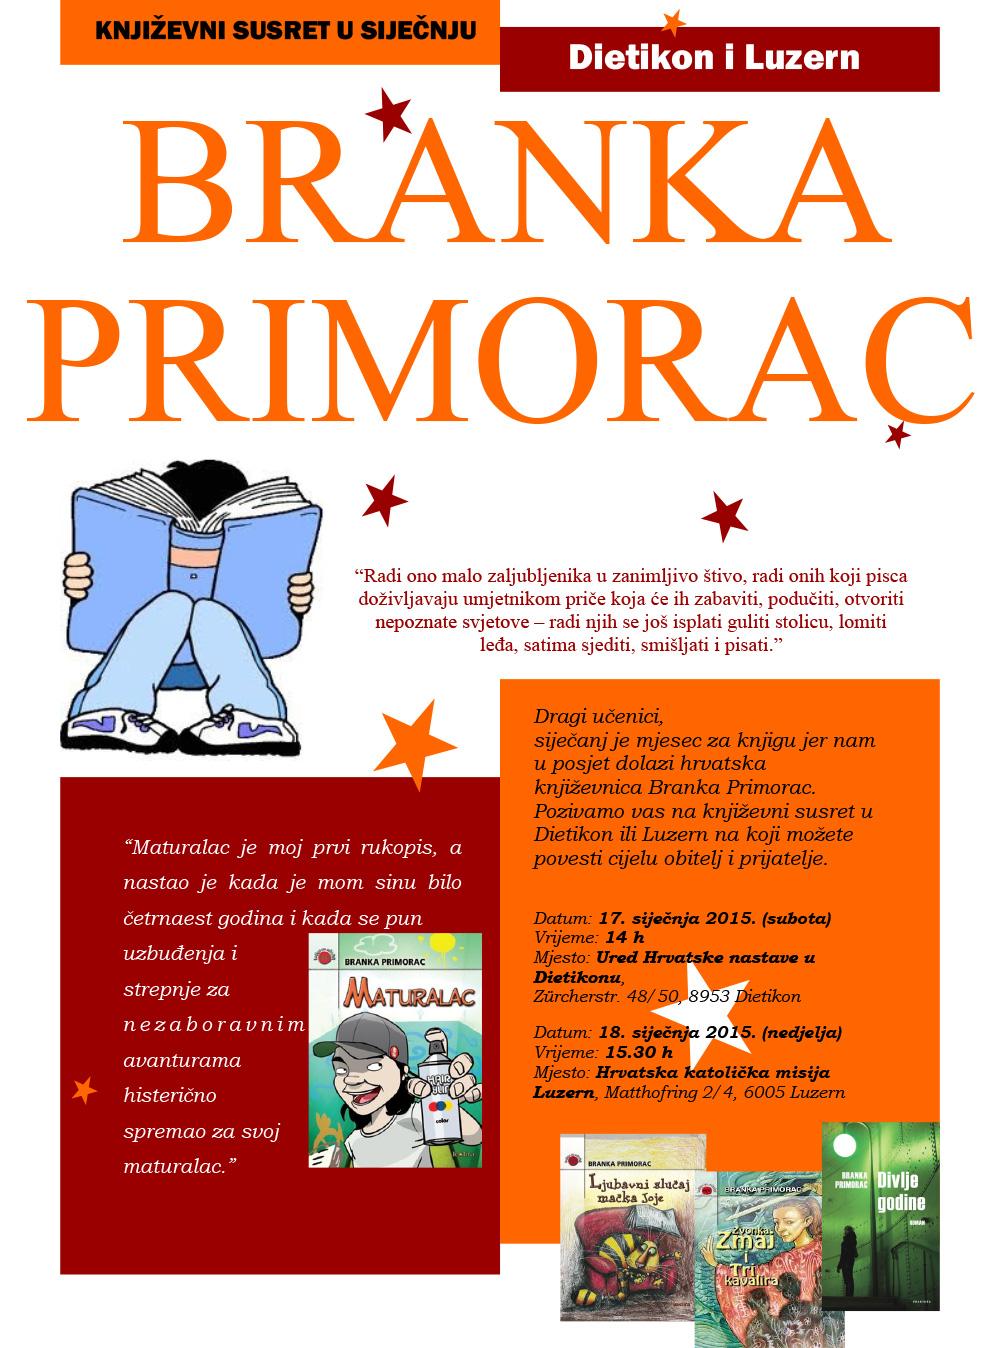 Branka Primorac